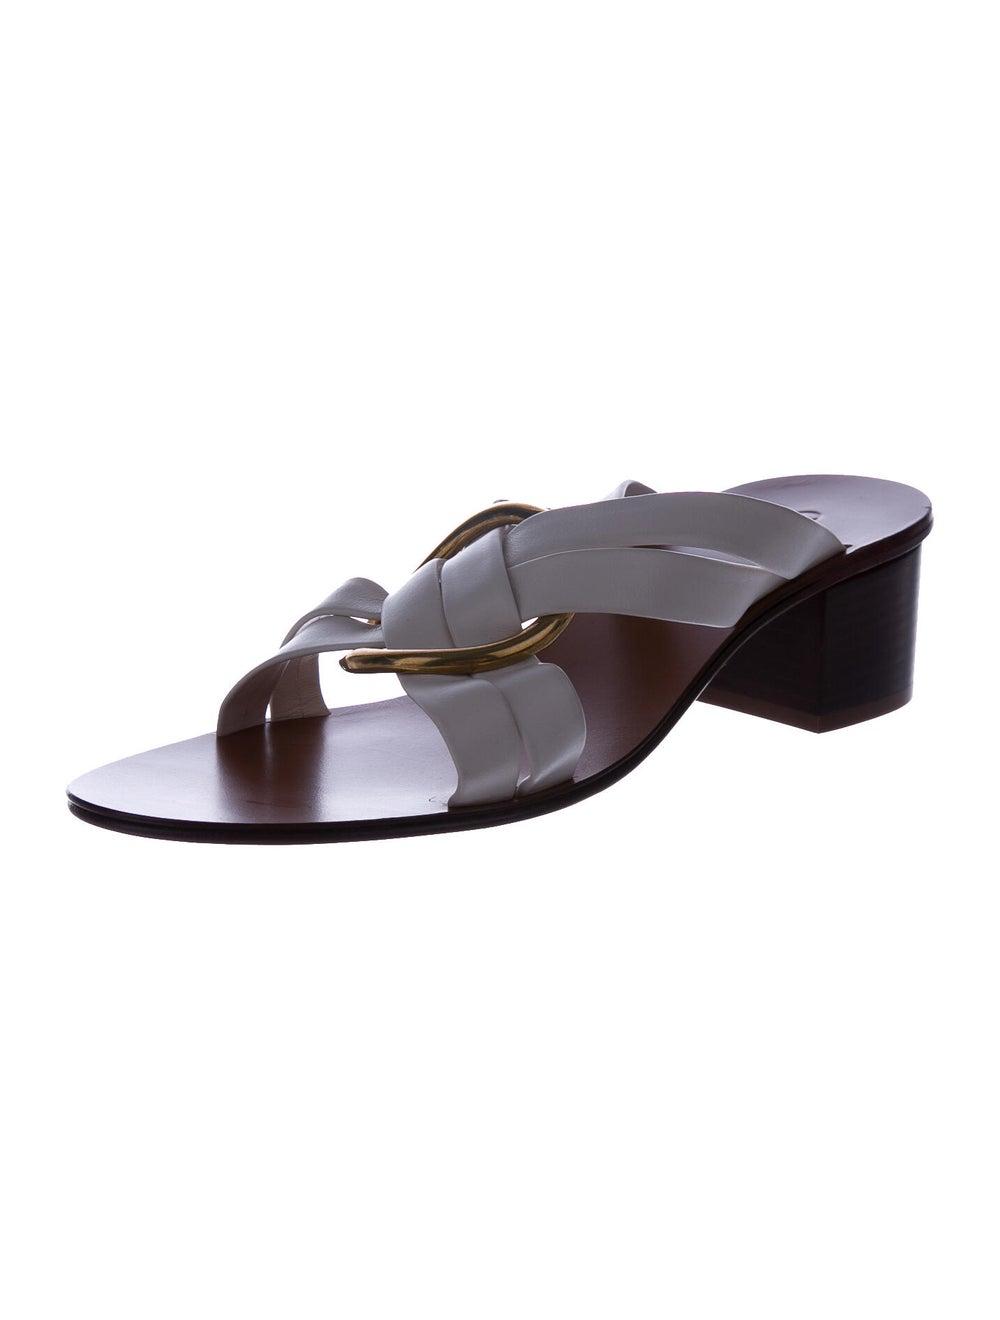 Chloé Leather Slides - image 2